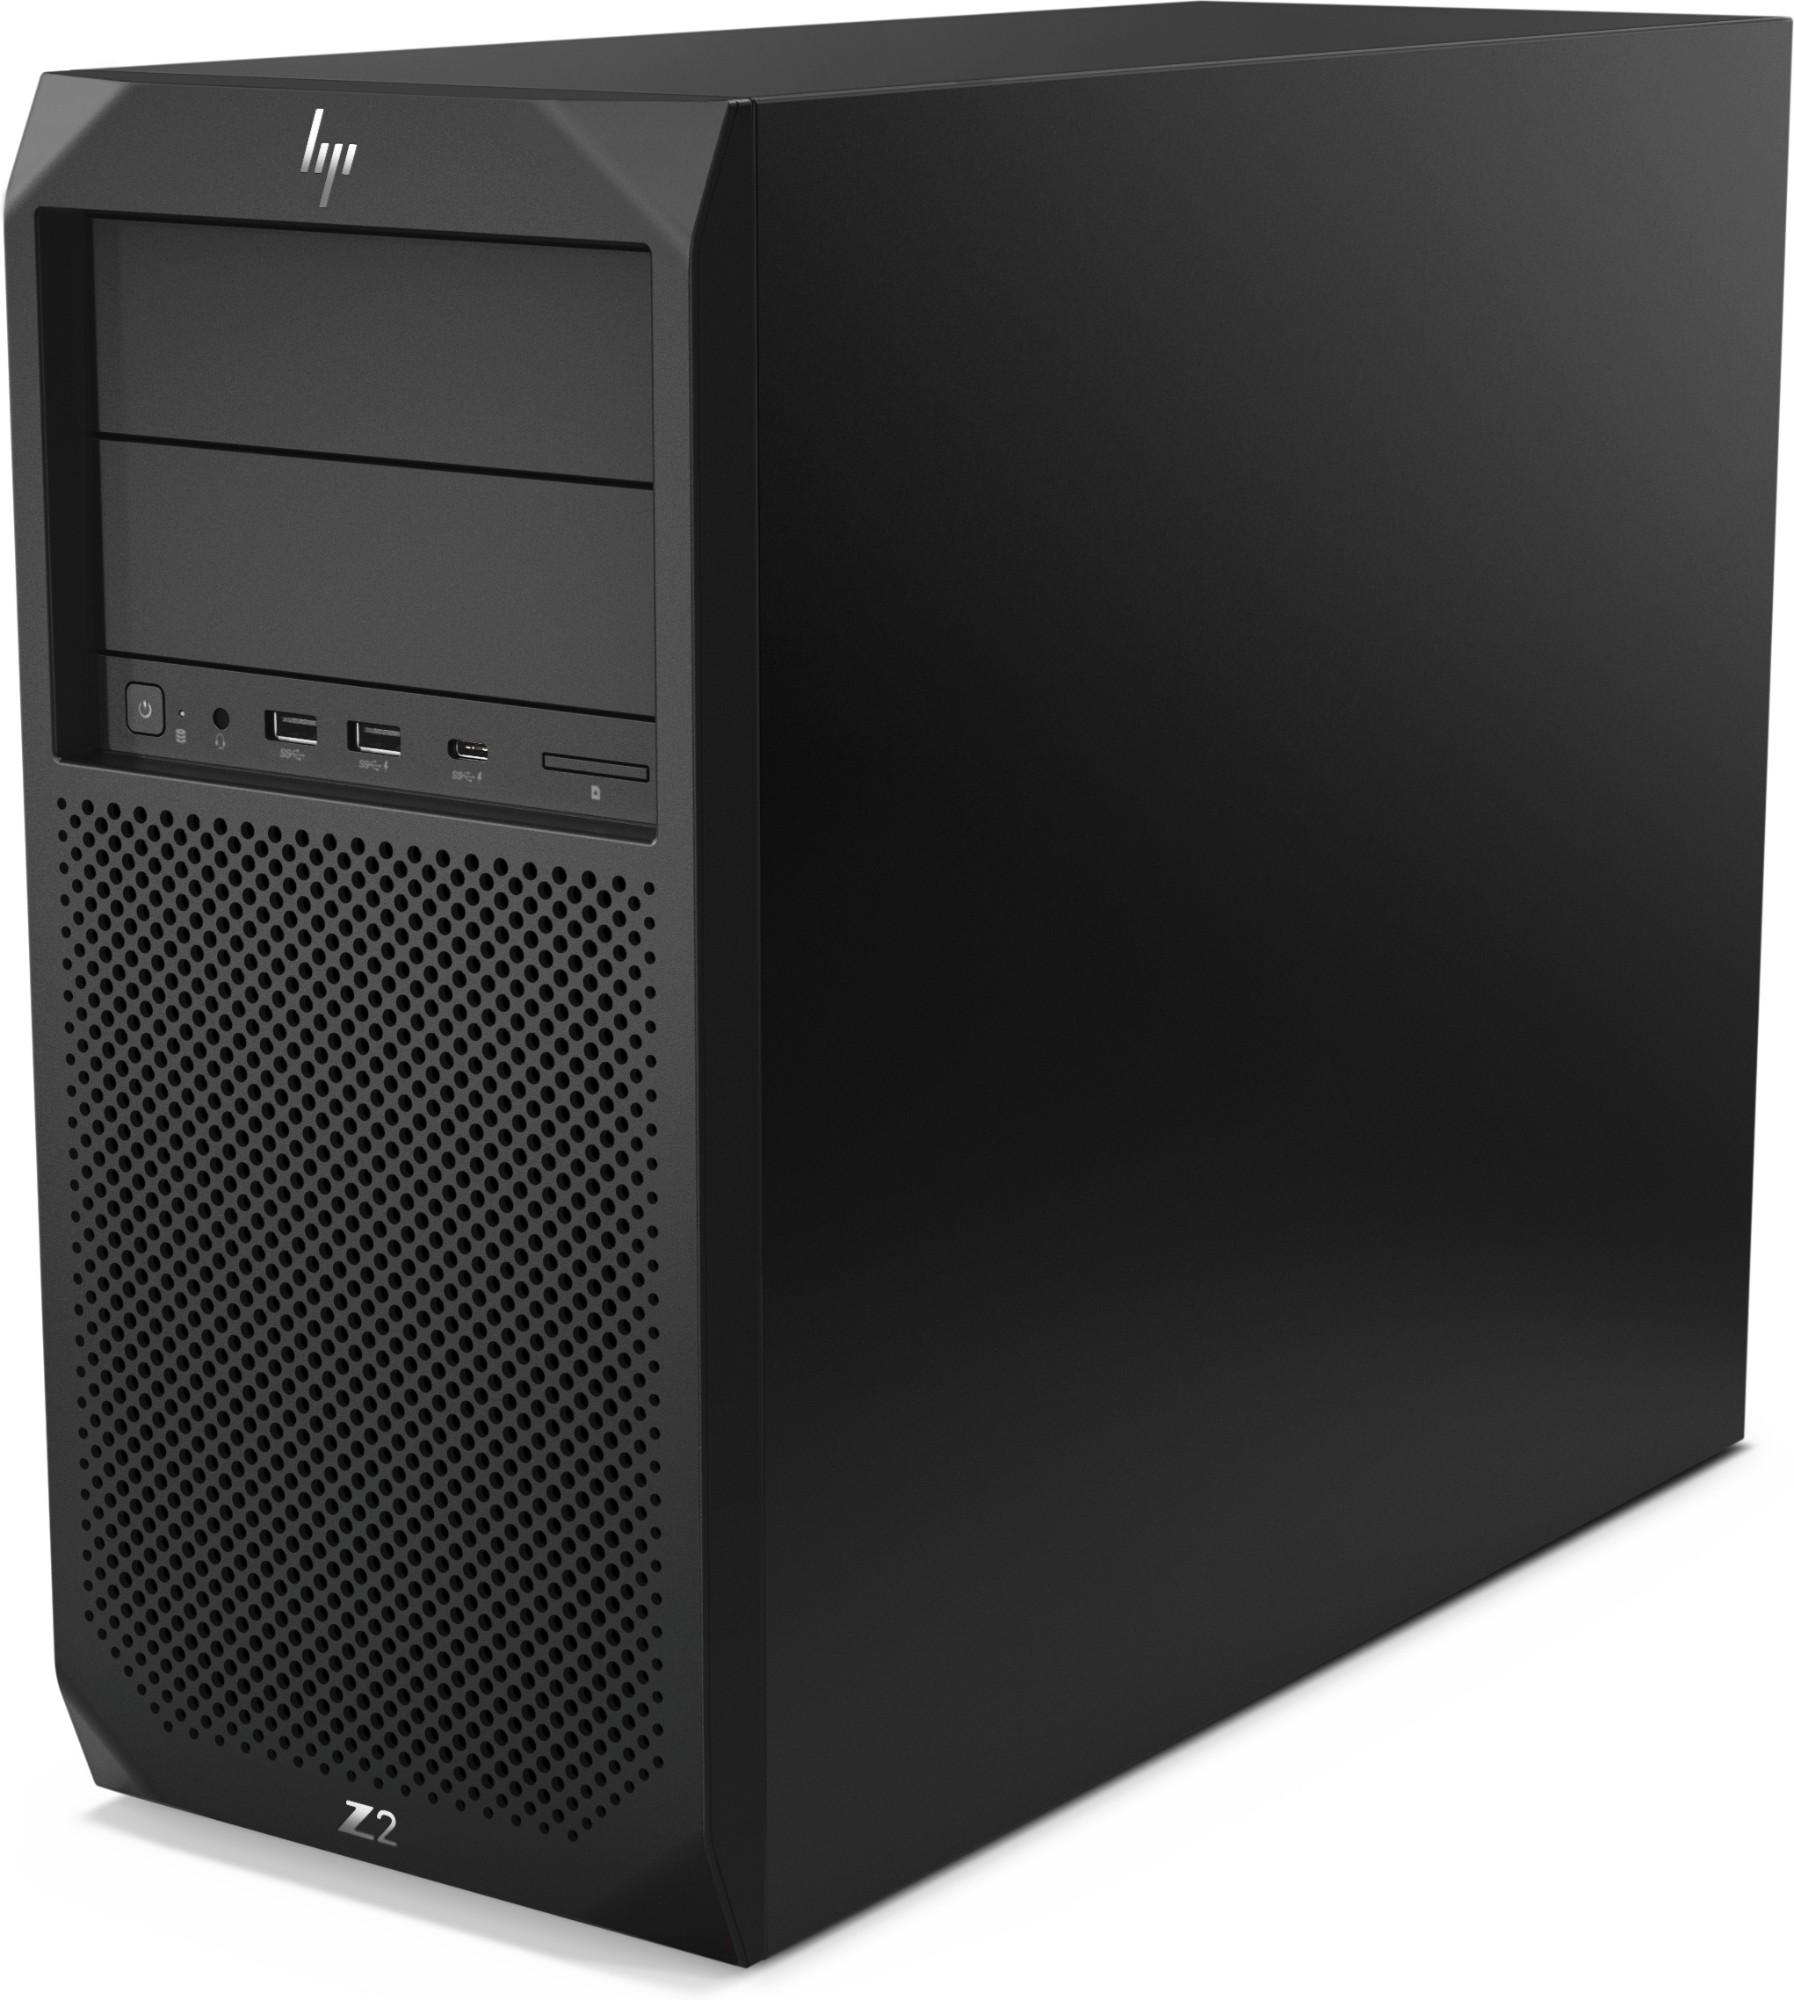 HP Z2 G4 8th gen Intel® Core™ i7 i7-8700 16 GB DDR4-SDRAM 1000 GB HDD Tower Black Workstation Windows 10 Pro